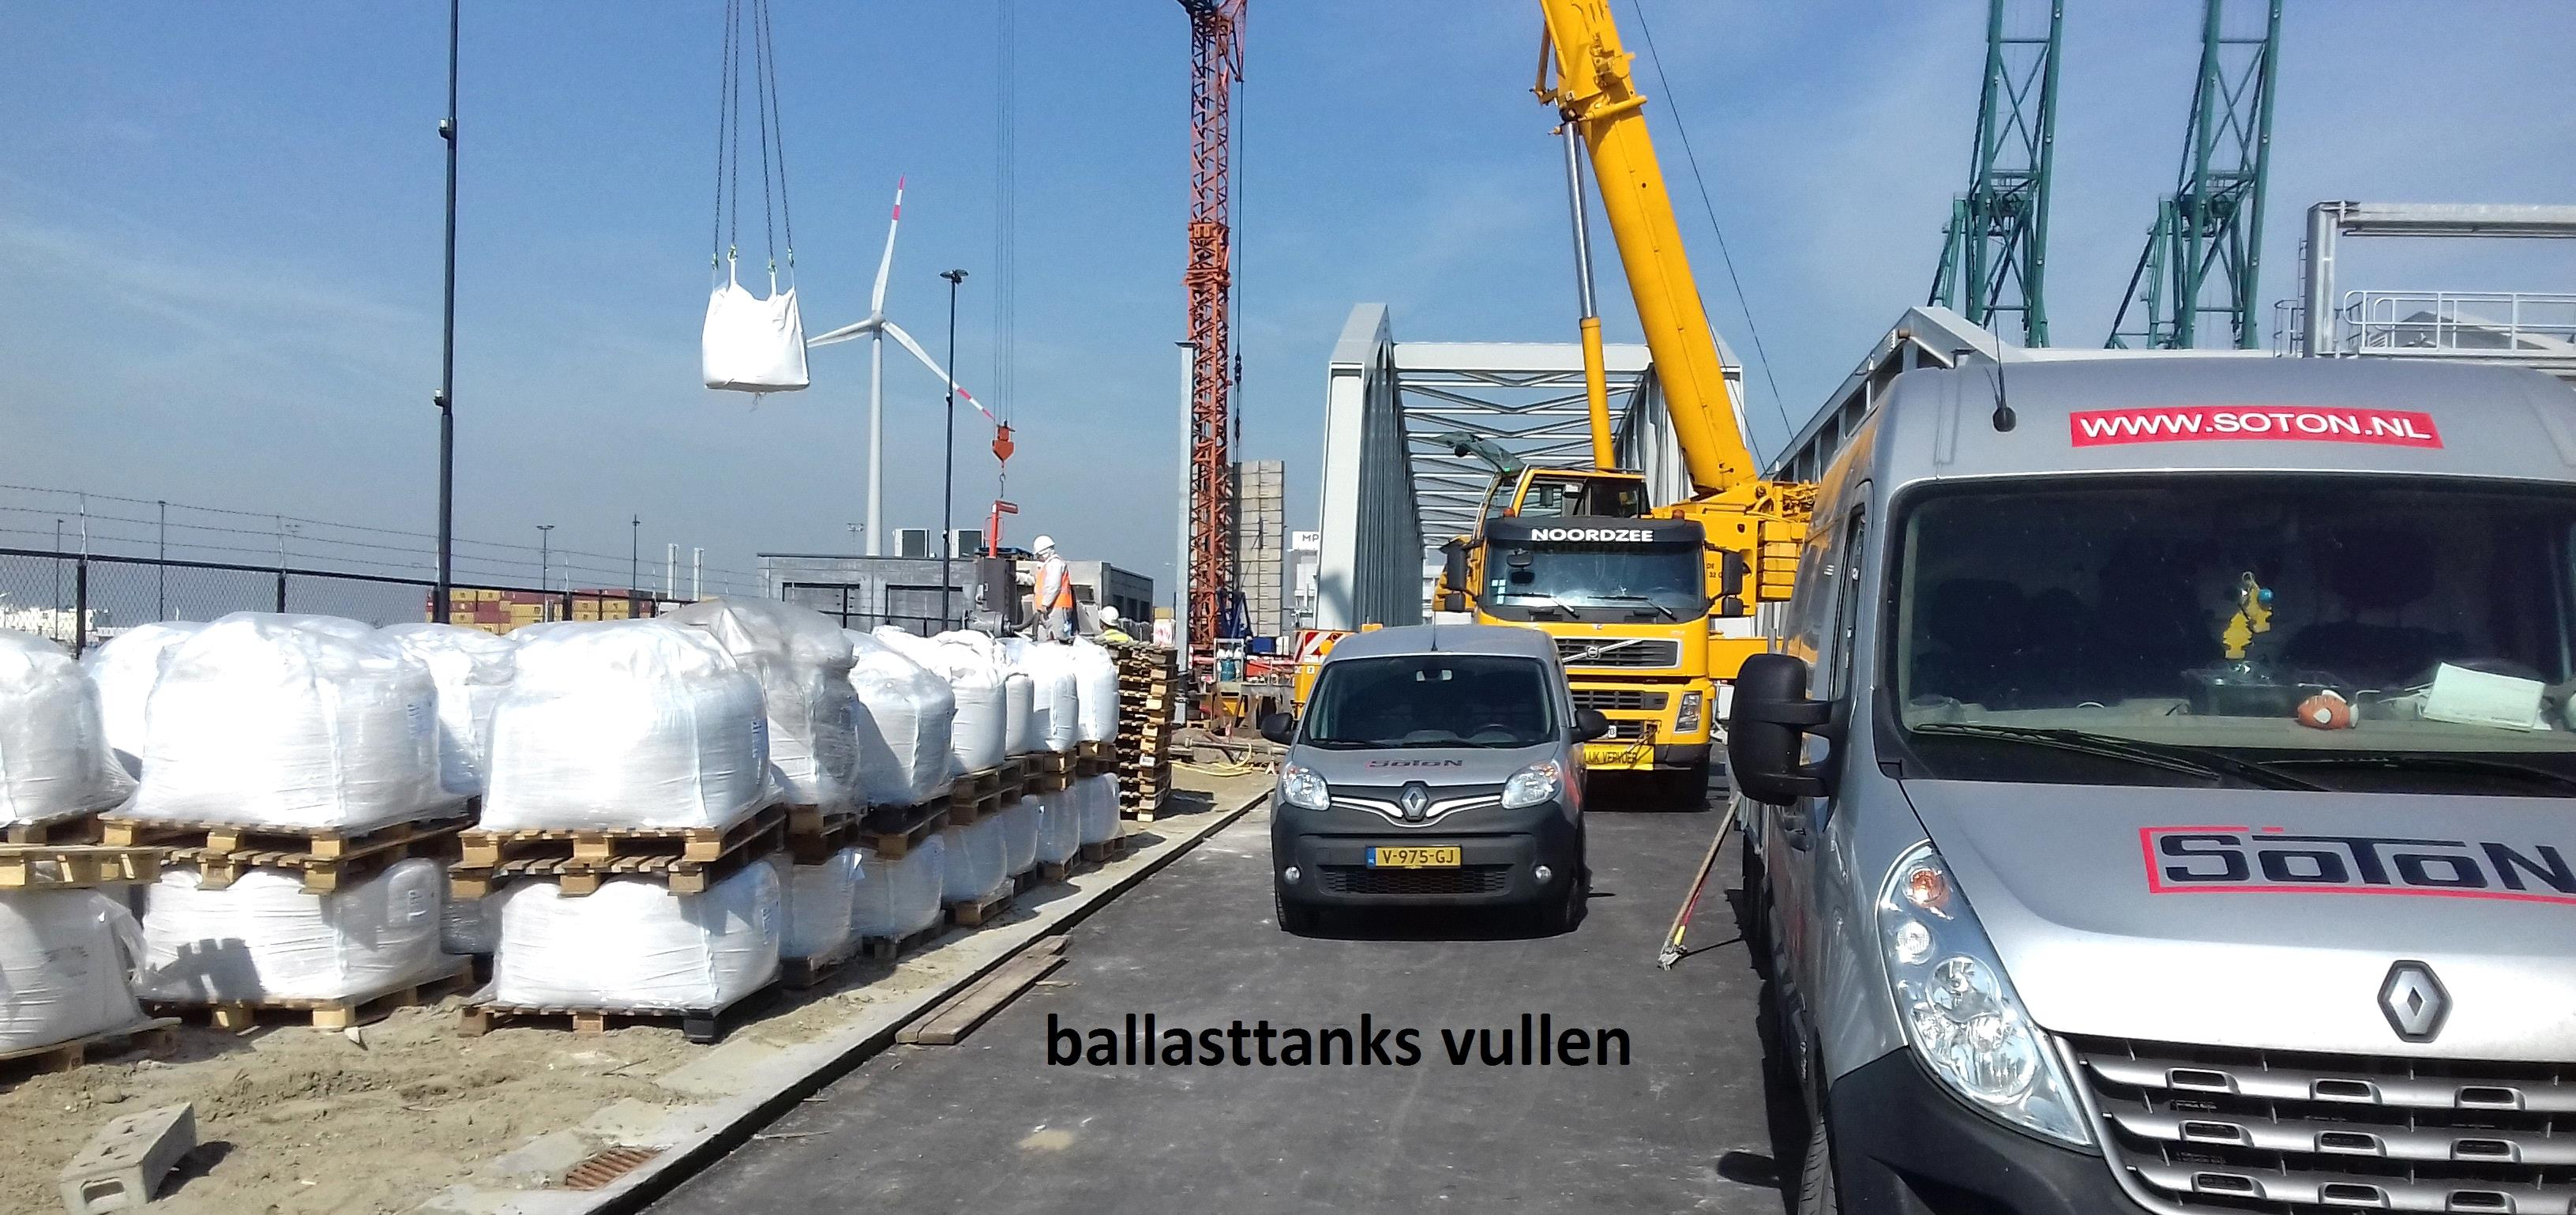 ballast tanks vullen